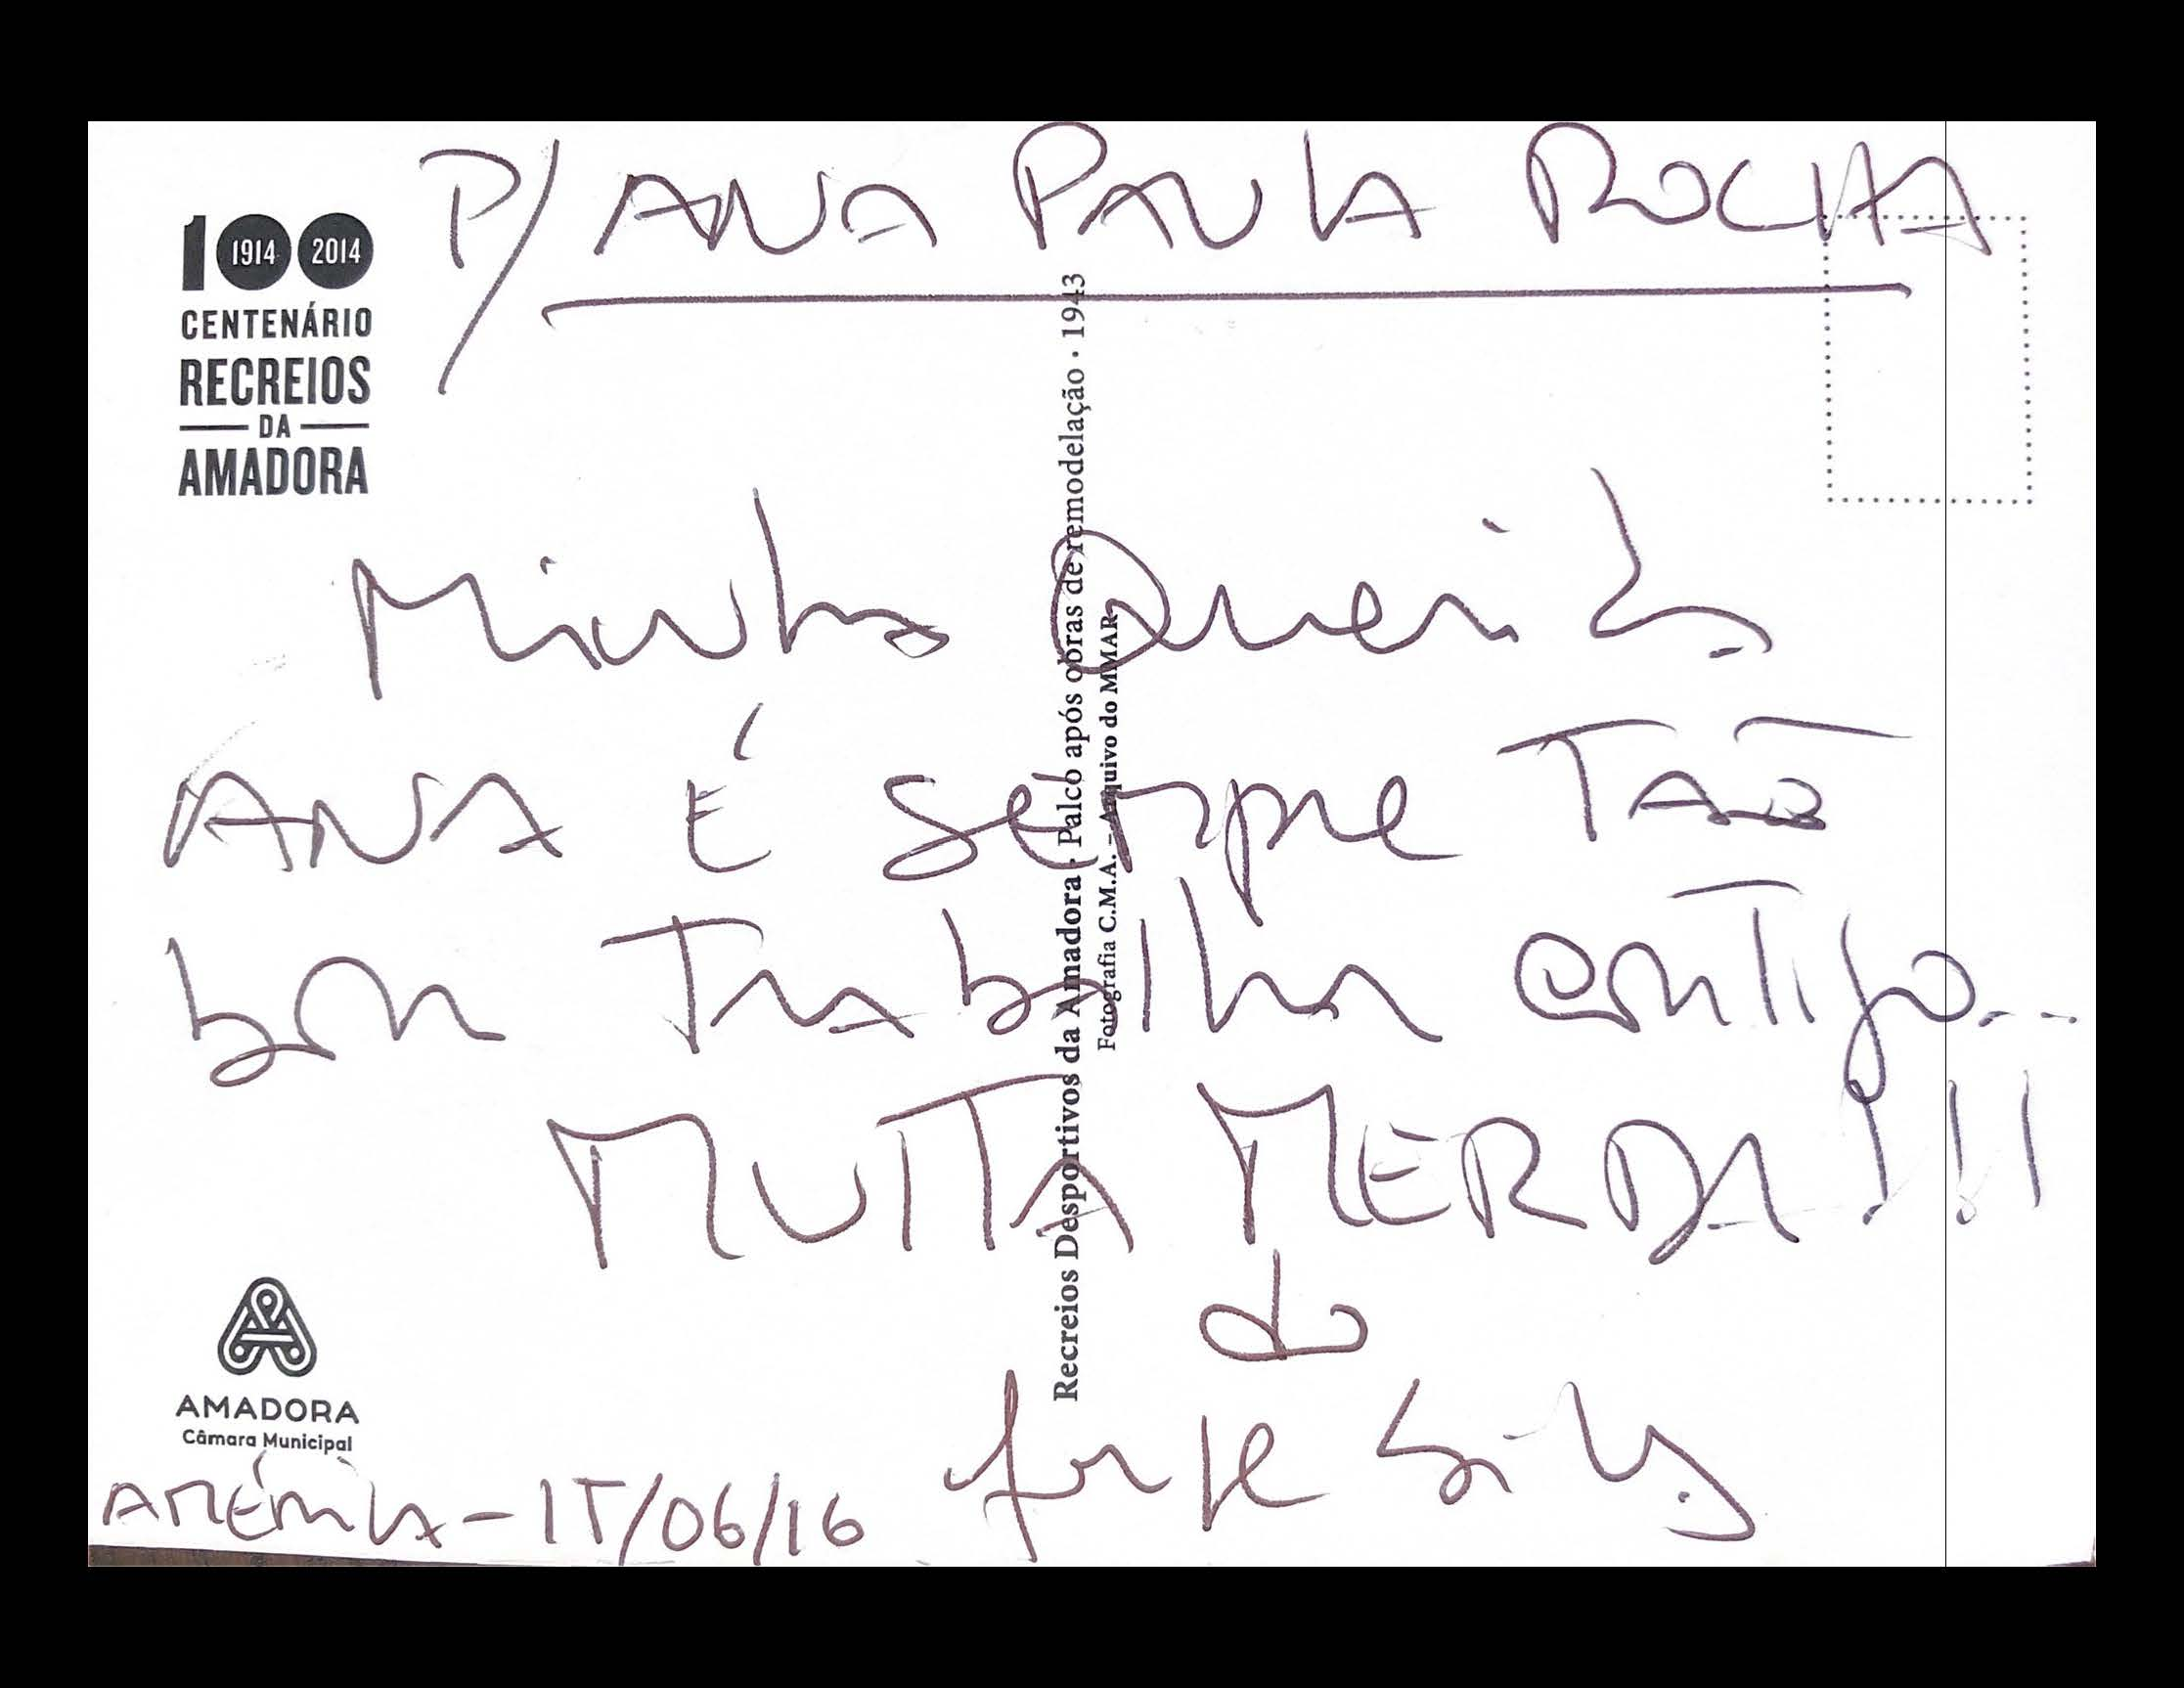 Ana Paula Rocha - Testemunhos - 016